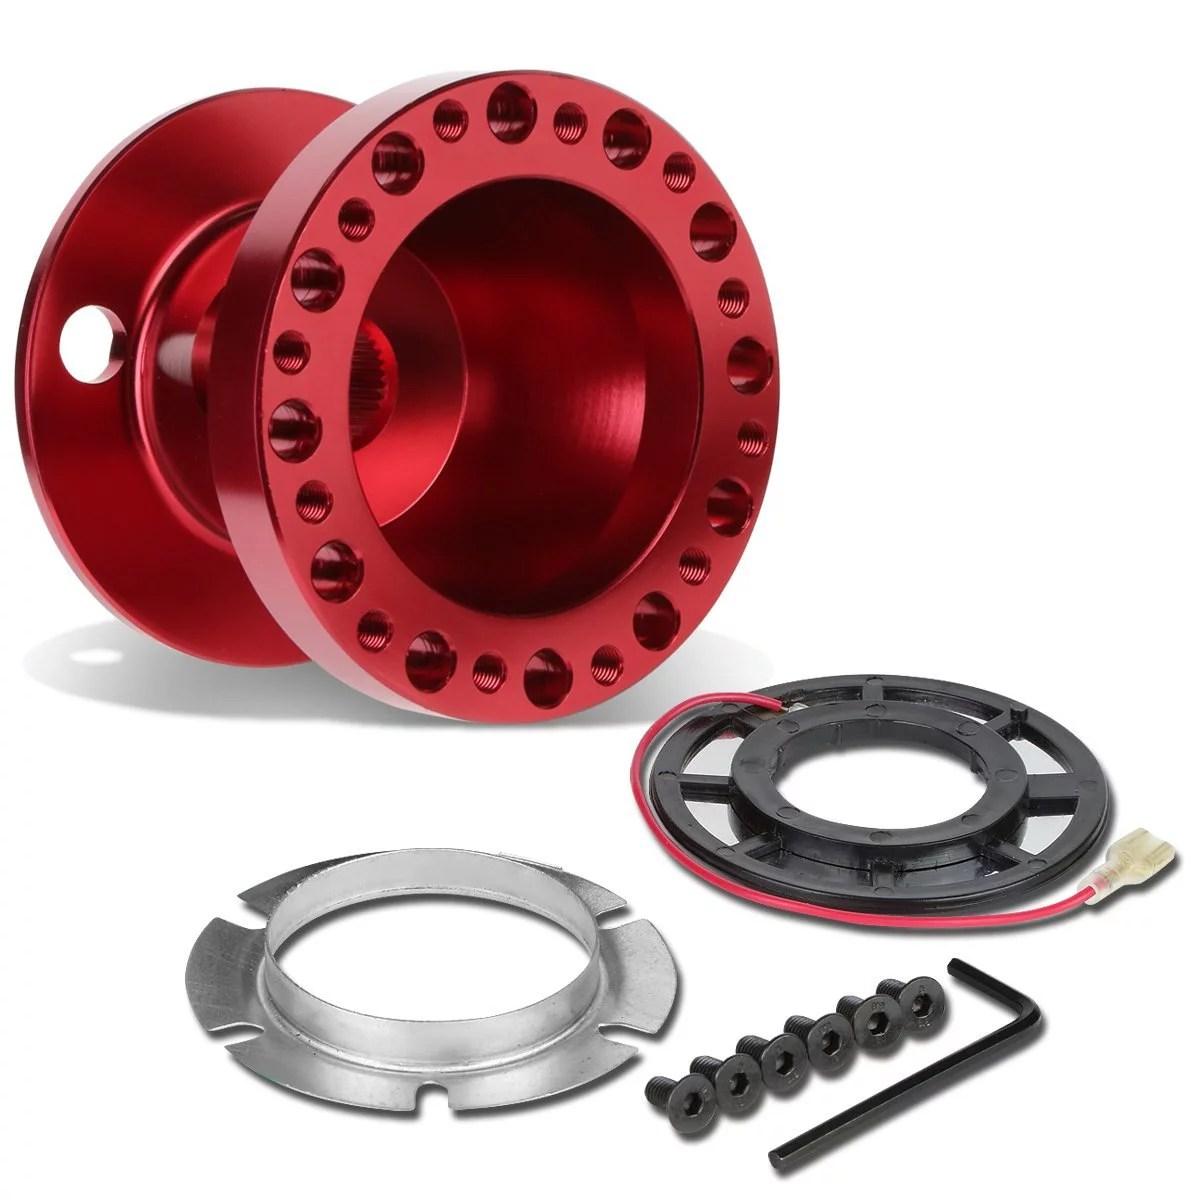 hight resolution of modifystreet red aluminum 6 hole bolt aftermarket racing steering wheel hub adapter kit for 04 11 mazda rx8 walmart com